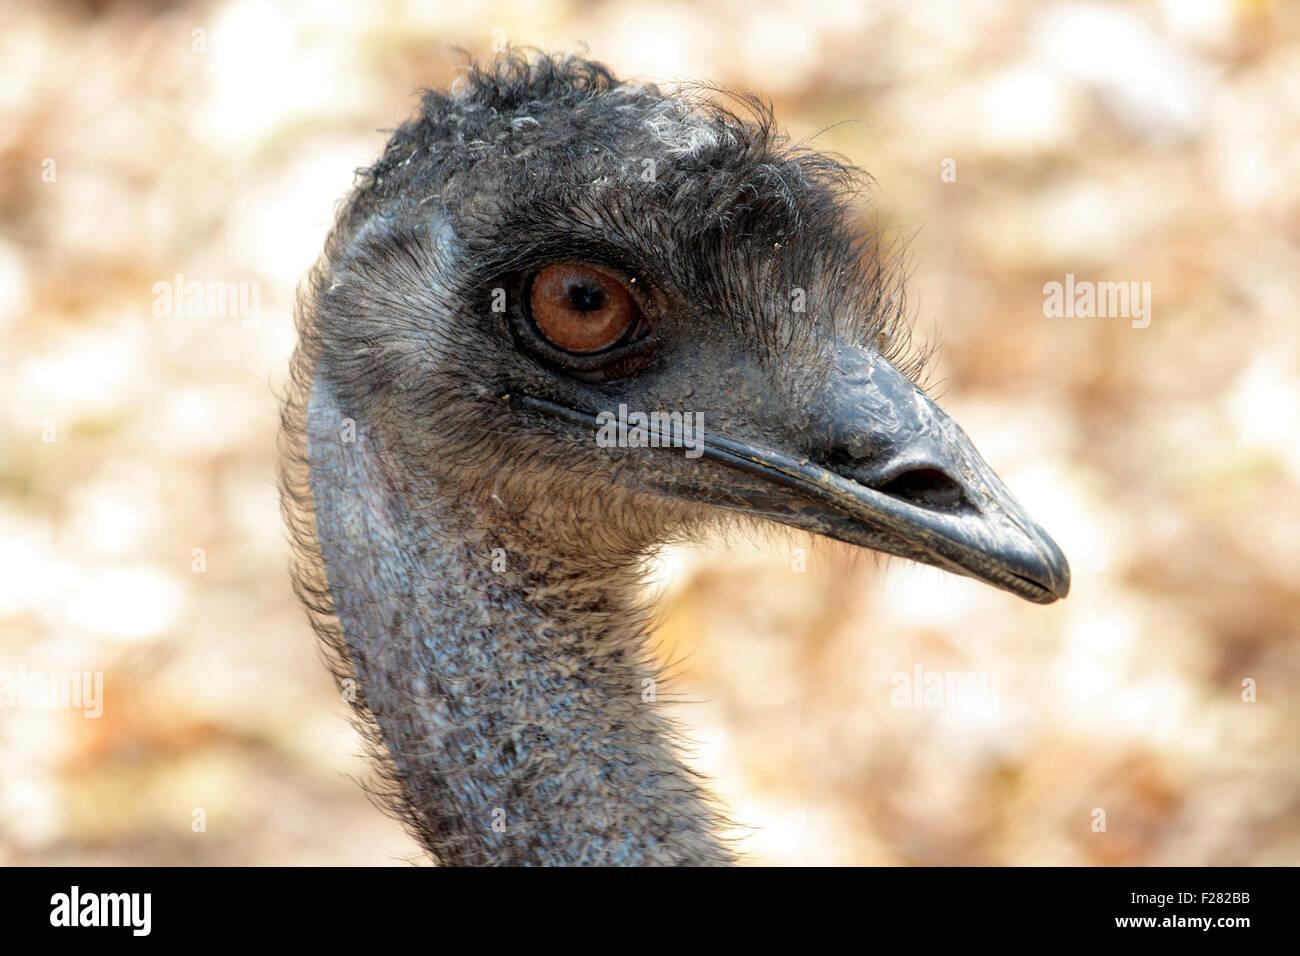 The emu bird - Stock Image